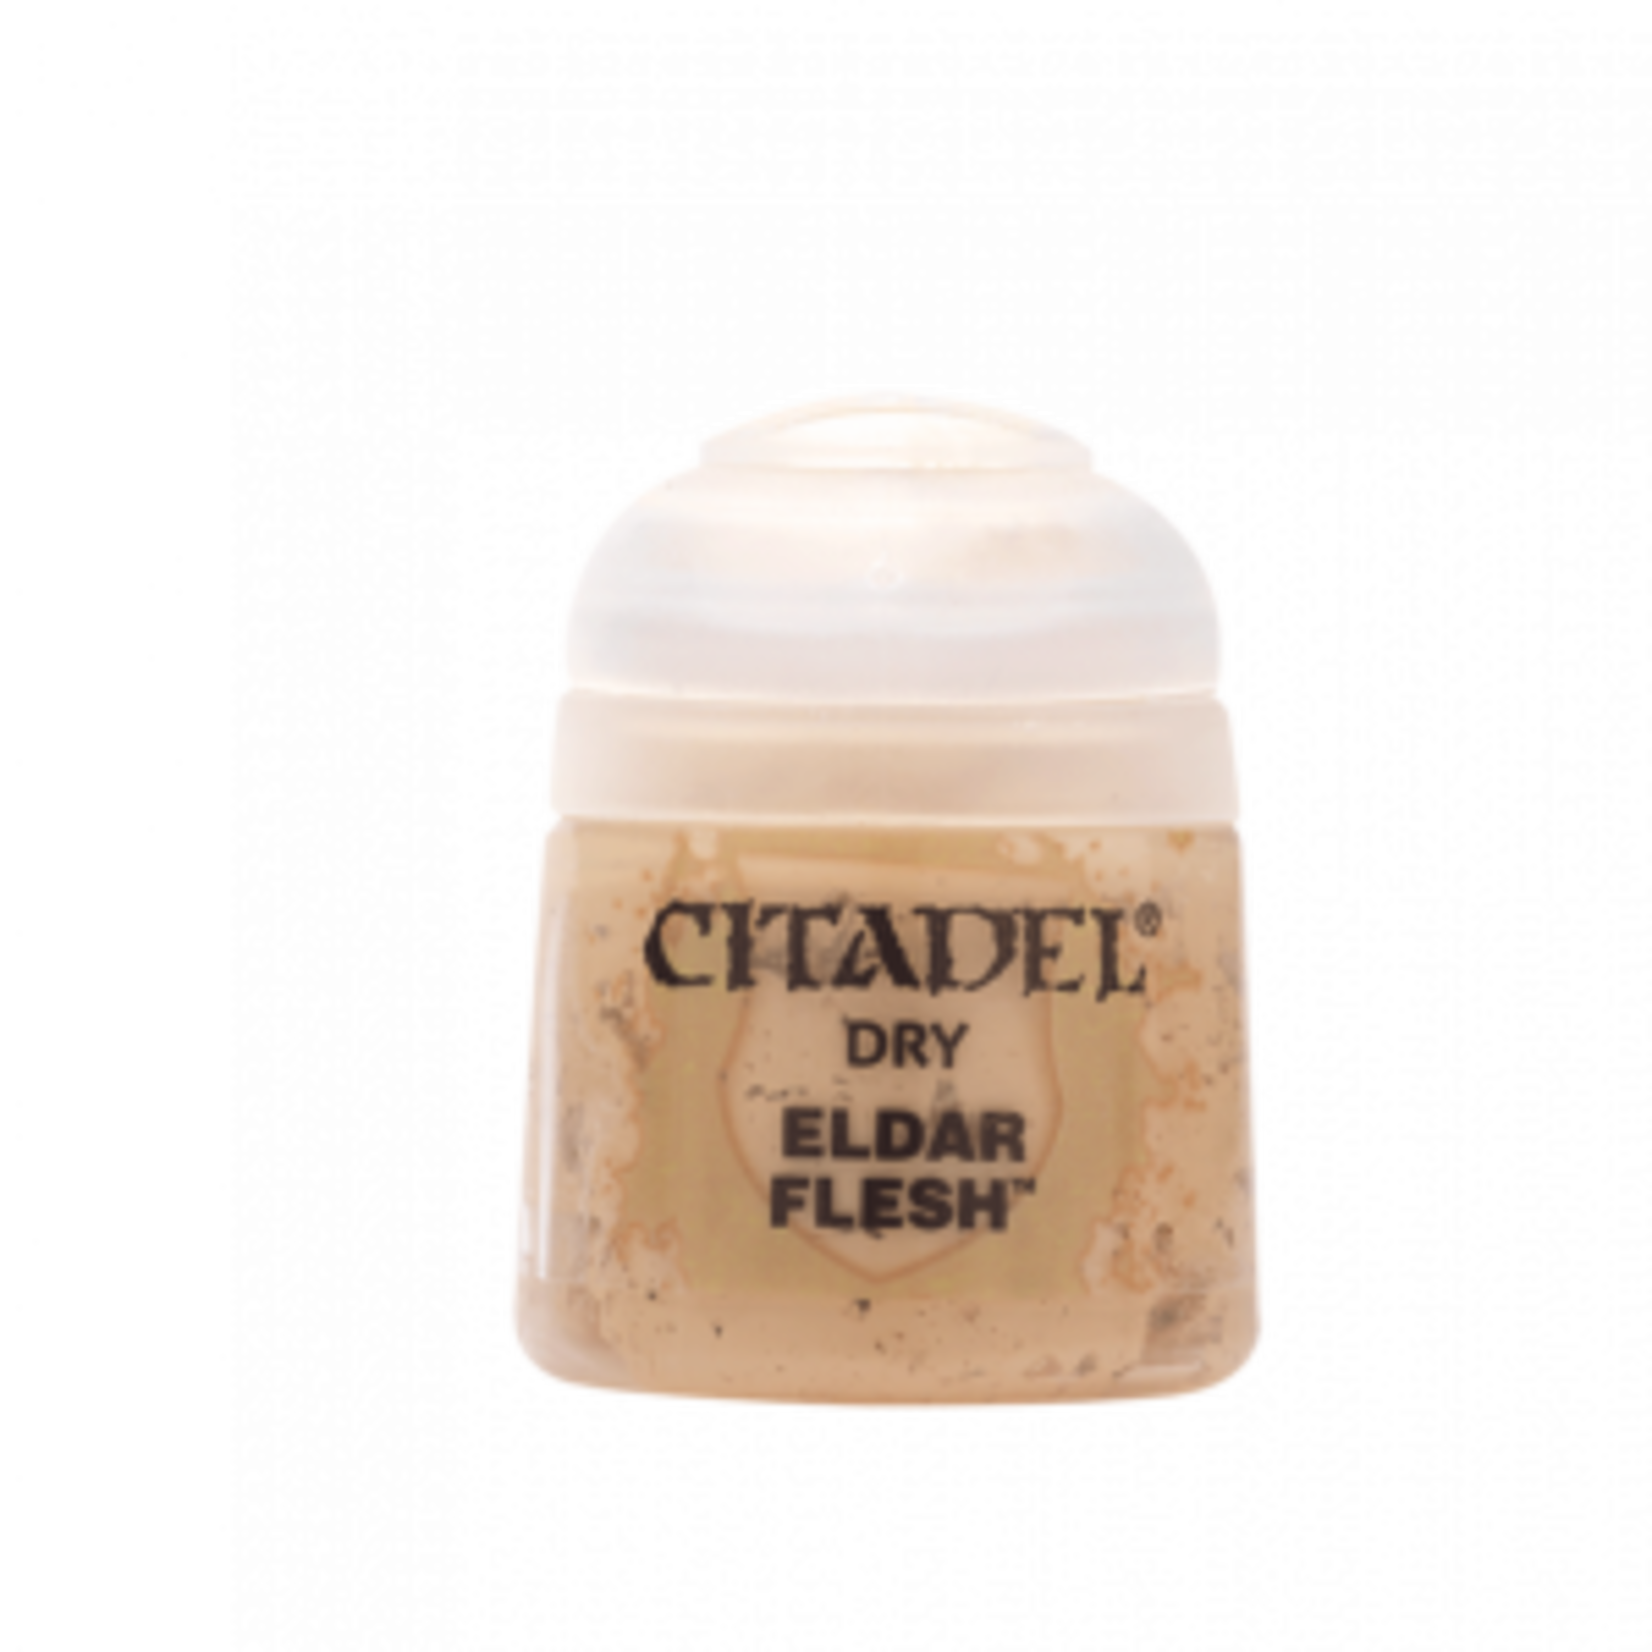 Citadel Dry Eldar Flesh